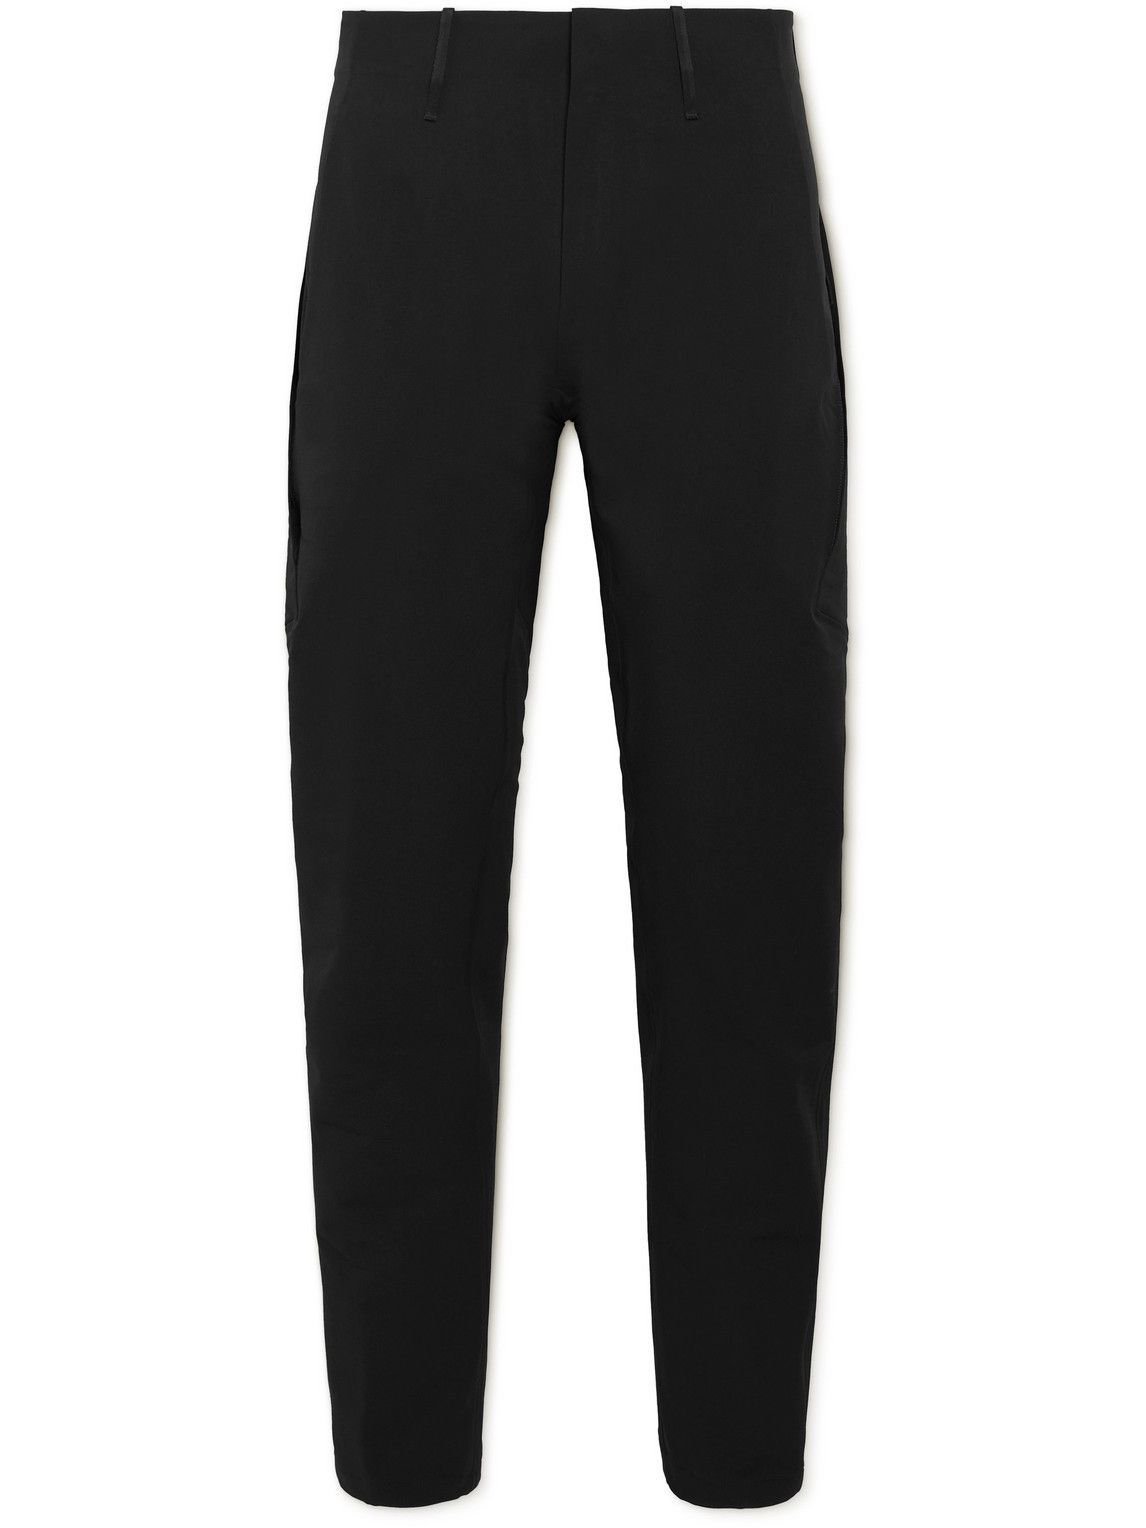 Photo: Veilance - Align MX Straight-Leg Burly Trousers - Black